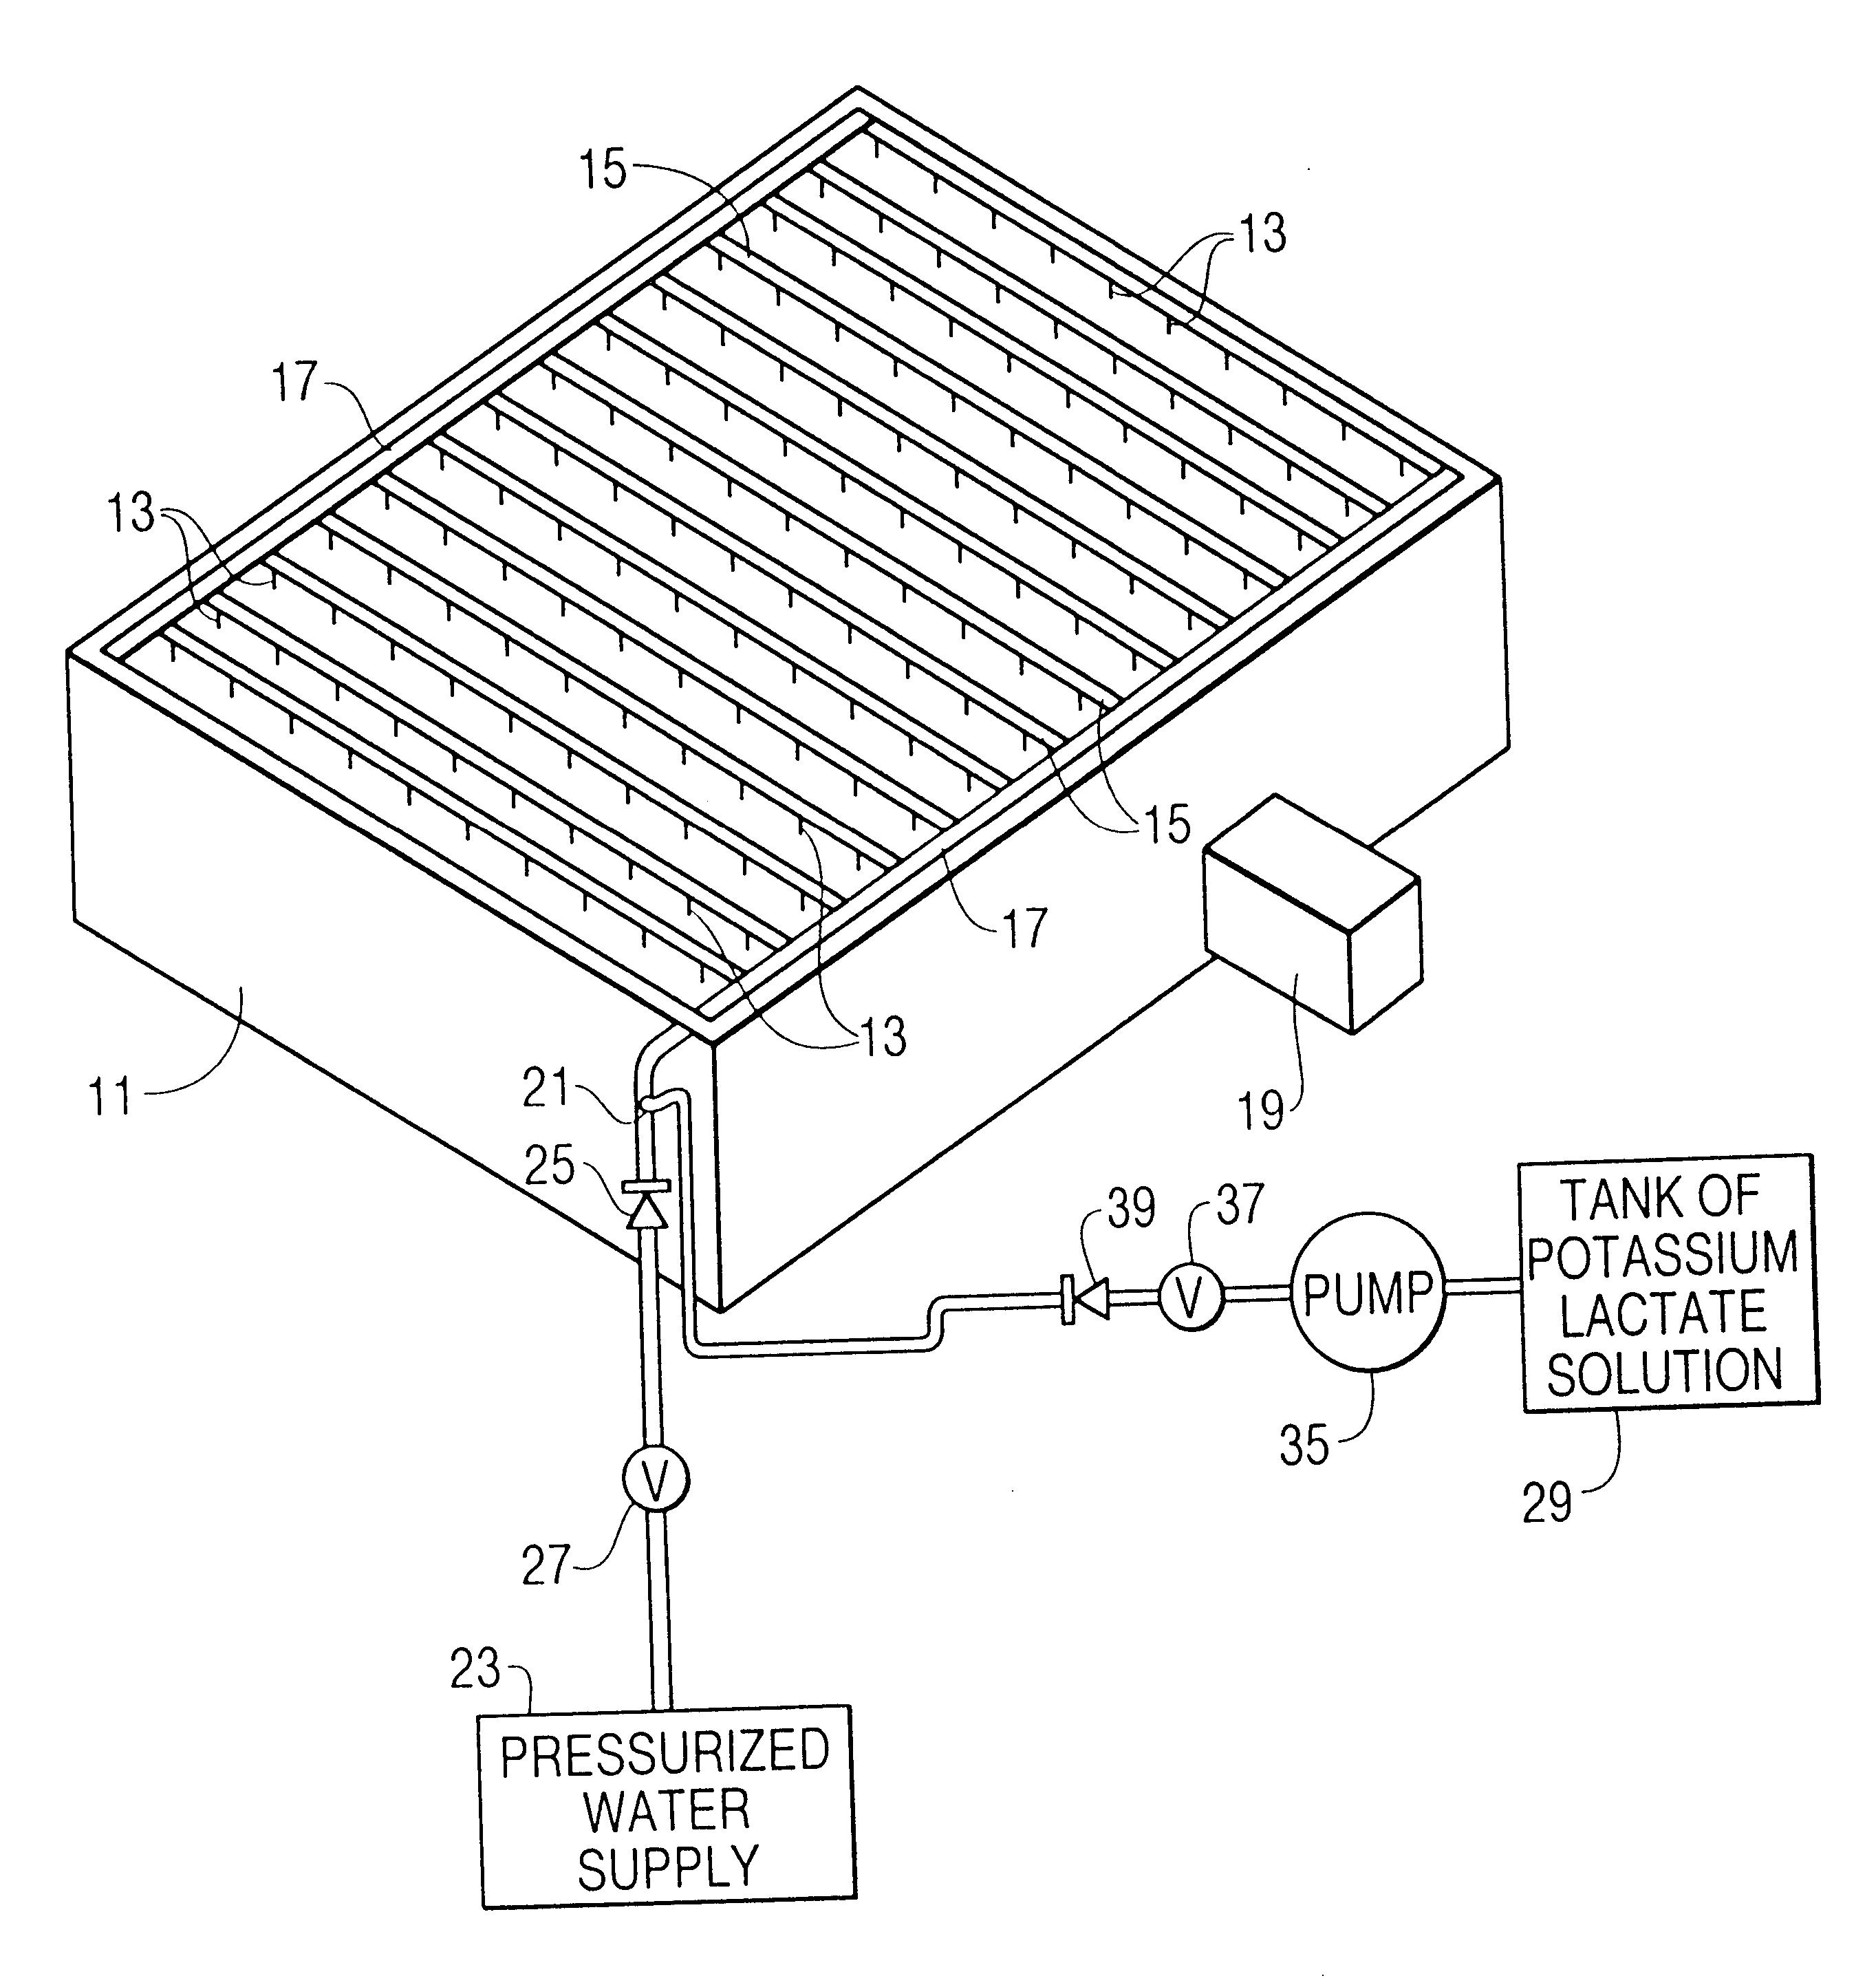 us6367560 wet sprinkler system for cold Standpipe System Design patent drawing